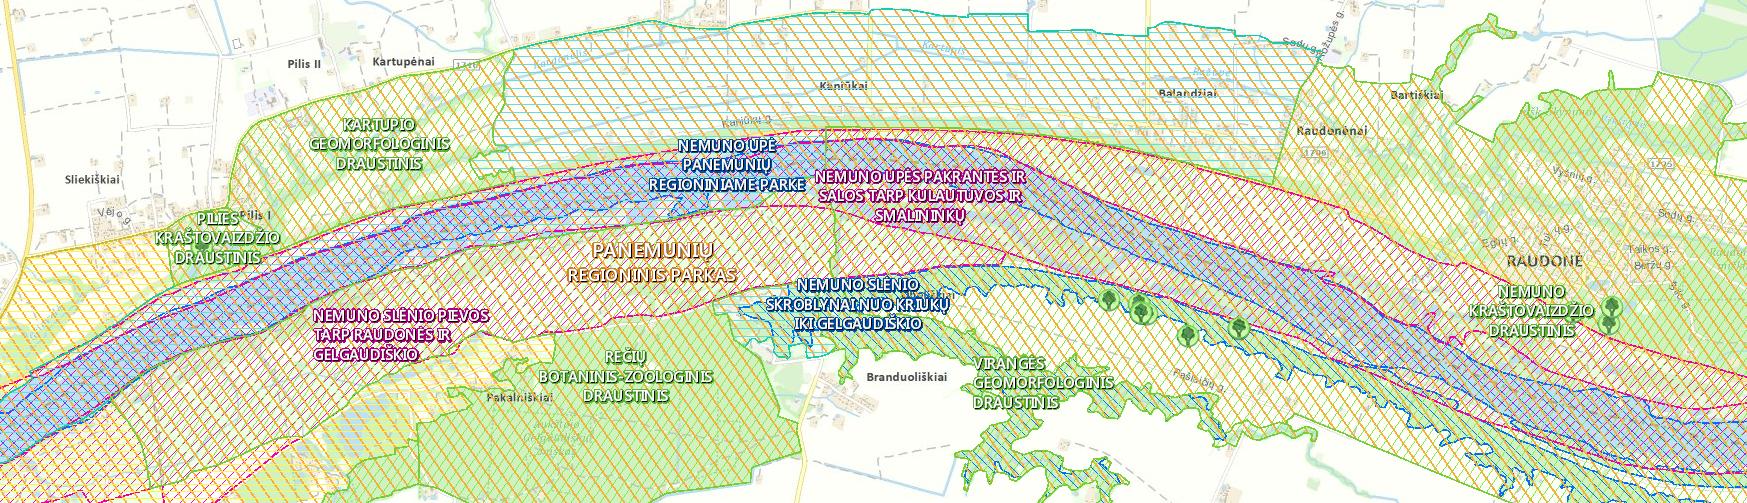 Naujienos - geoportal.lt